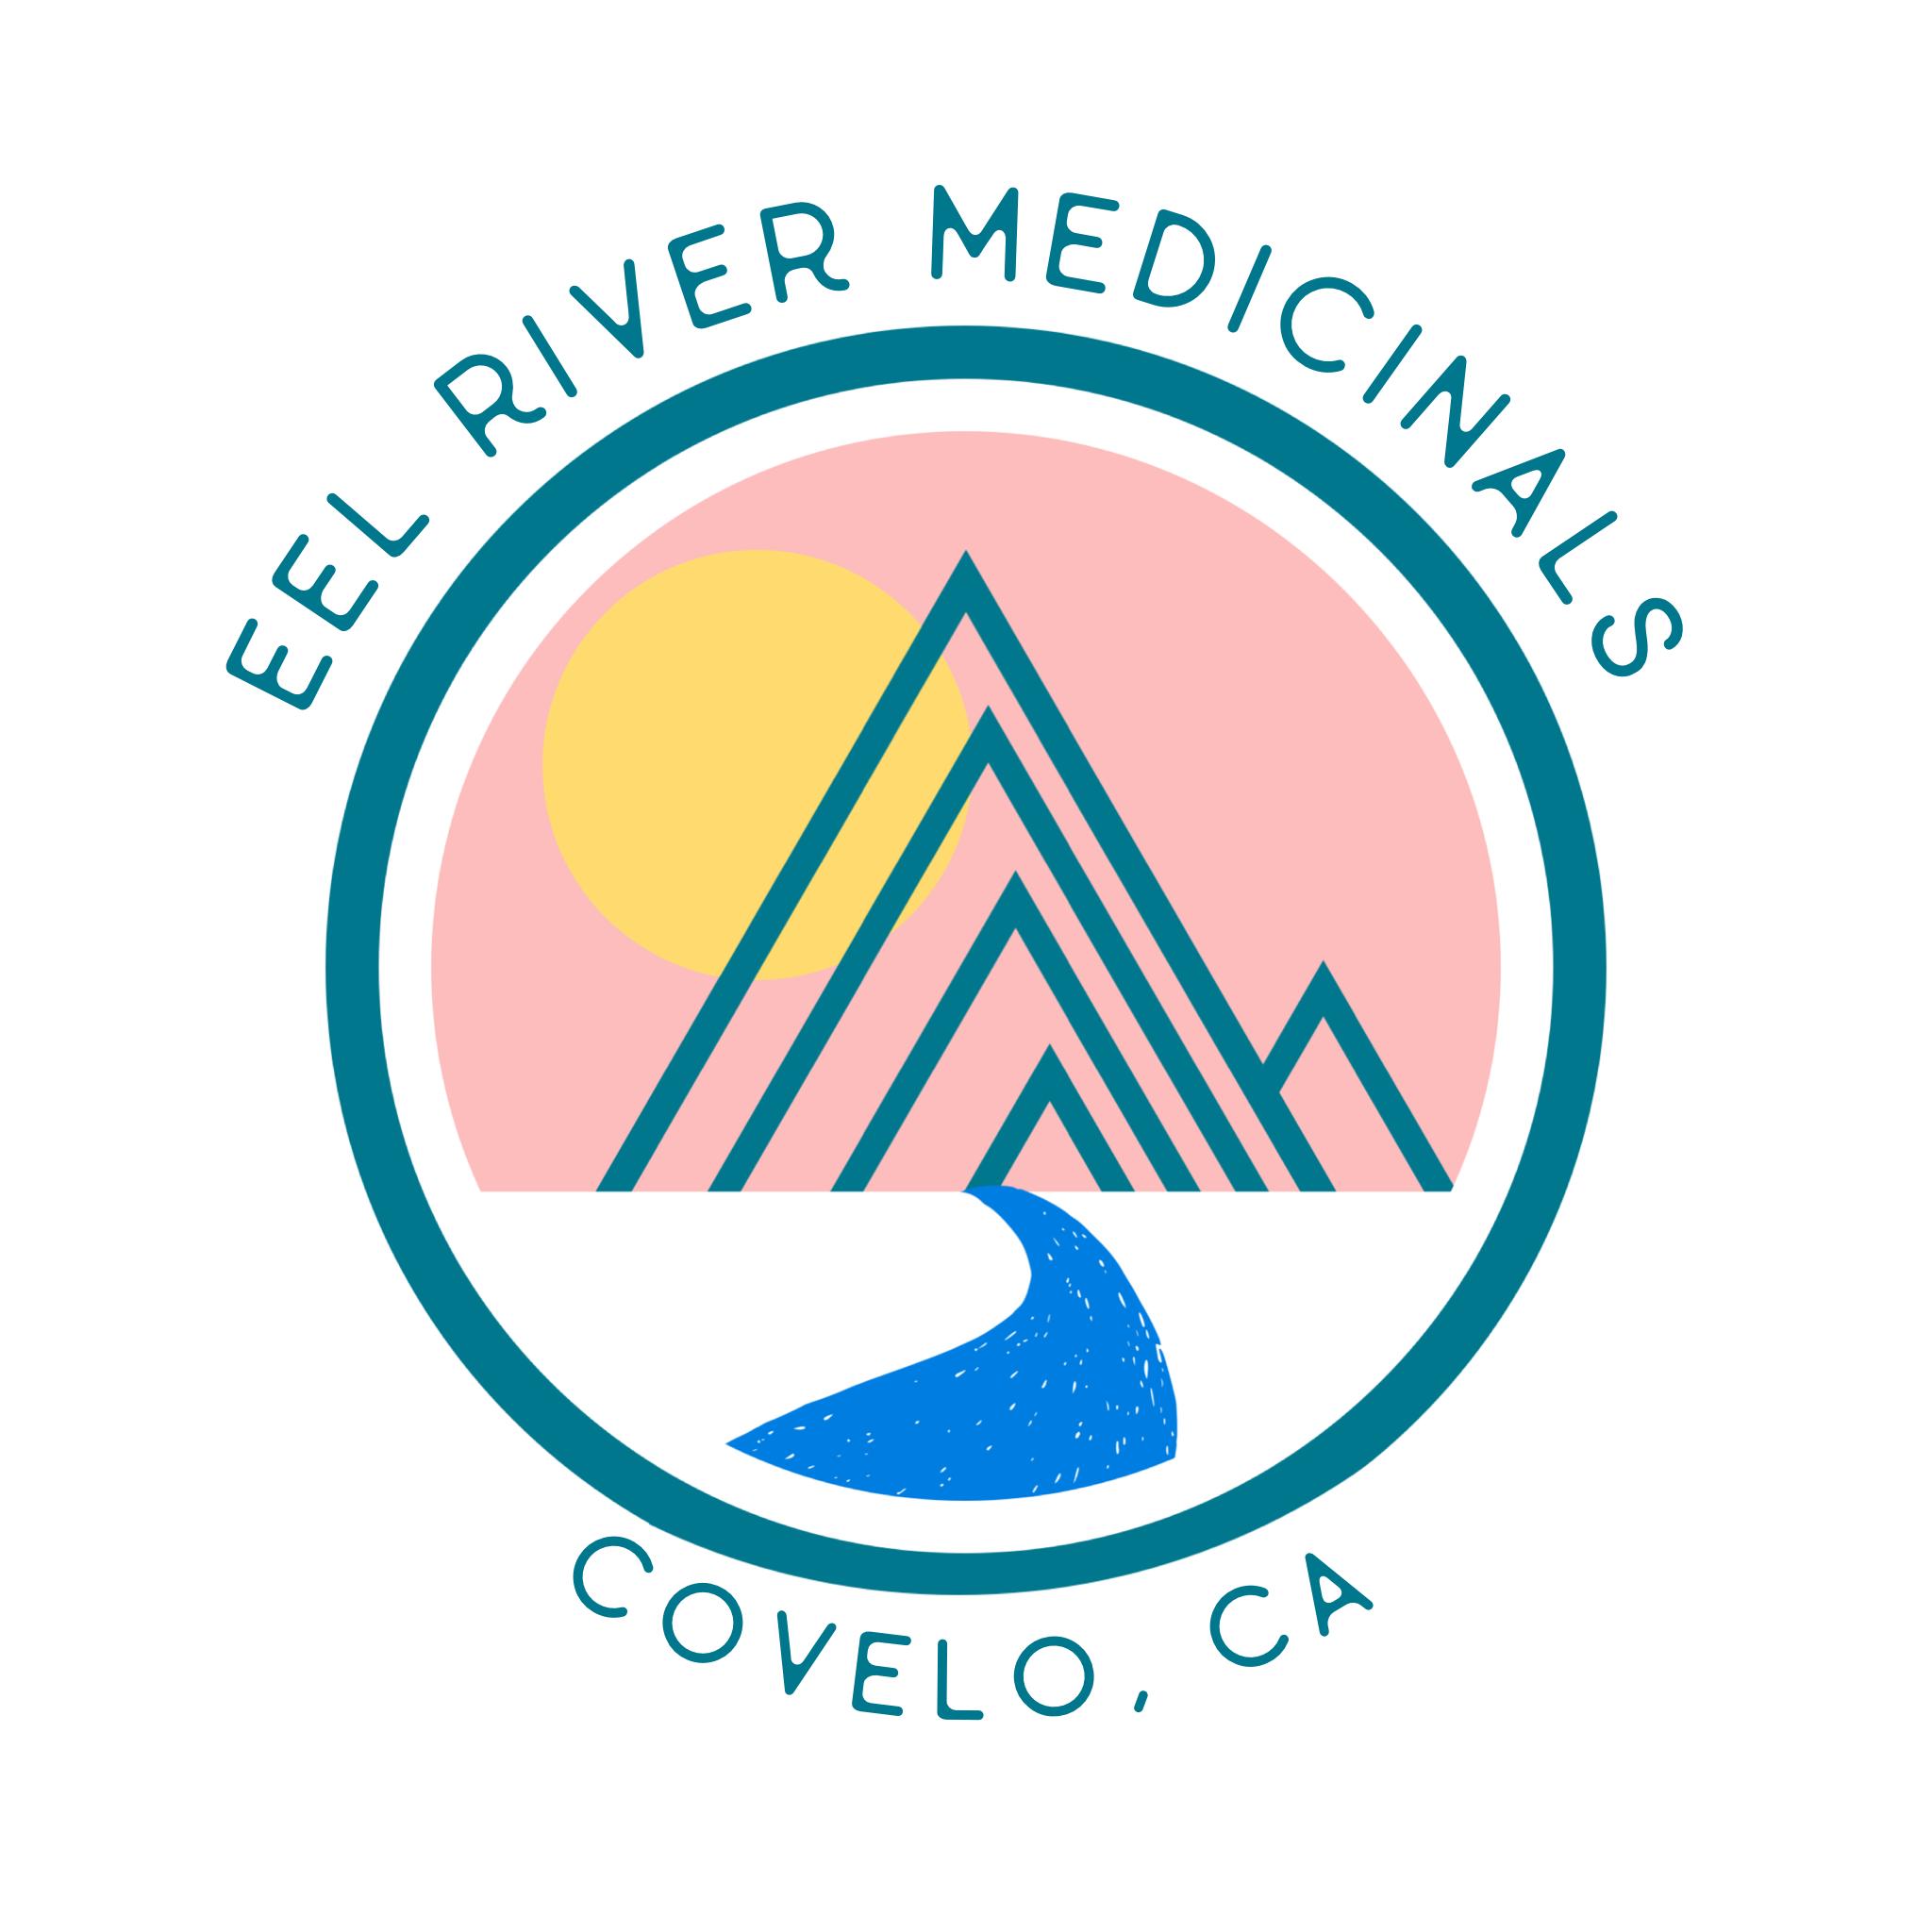 eelrivermedicnals logo.png